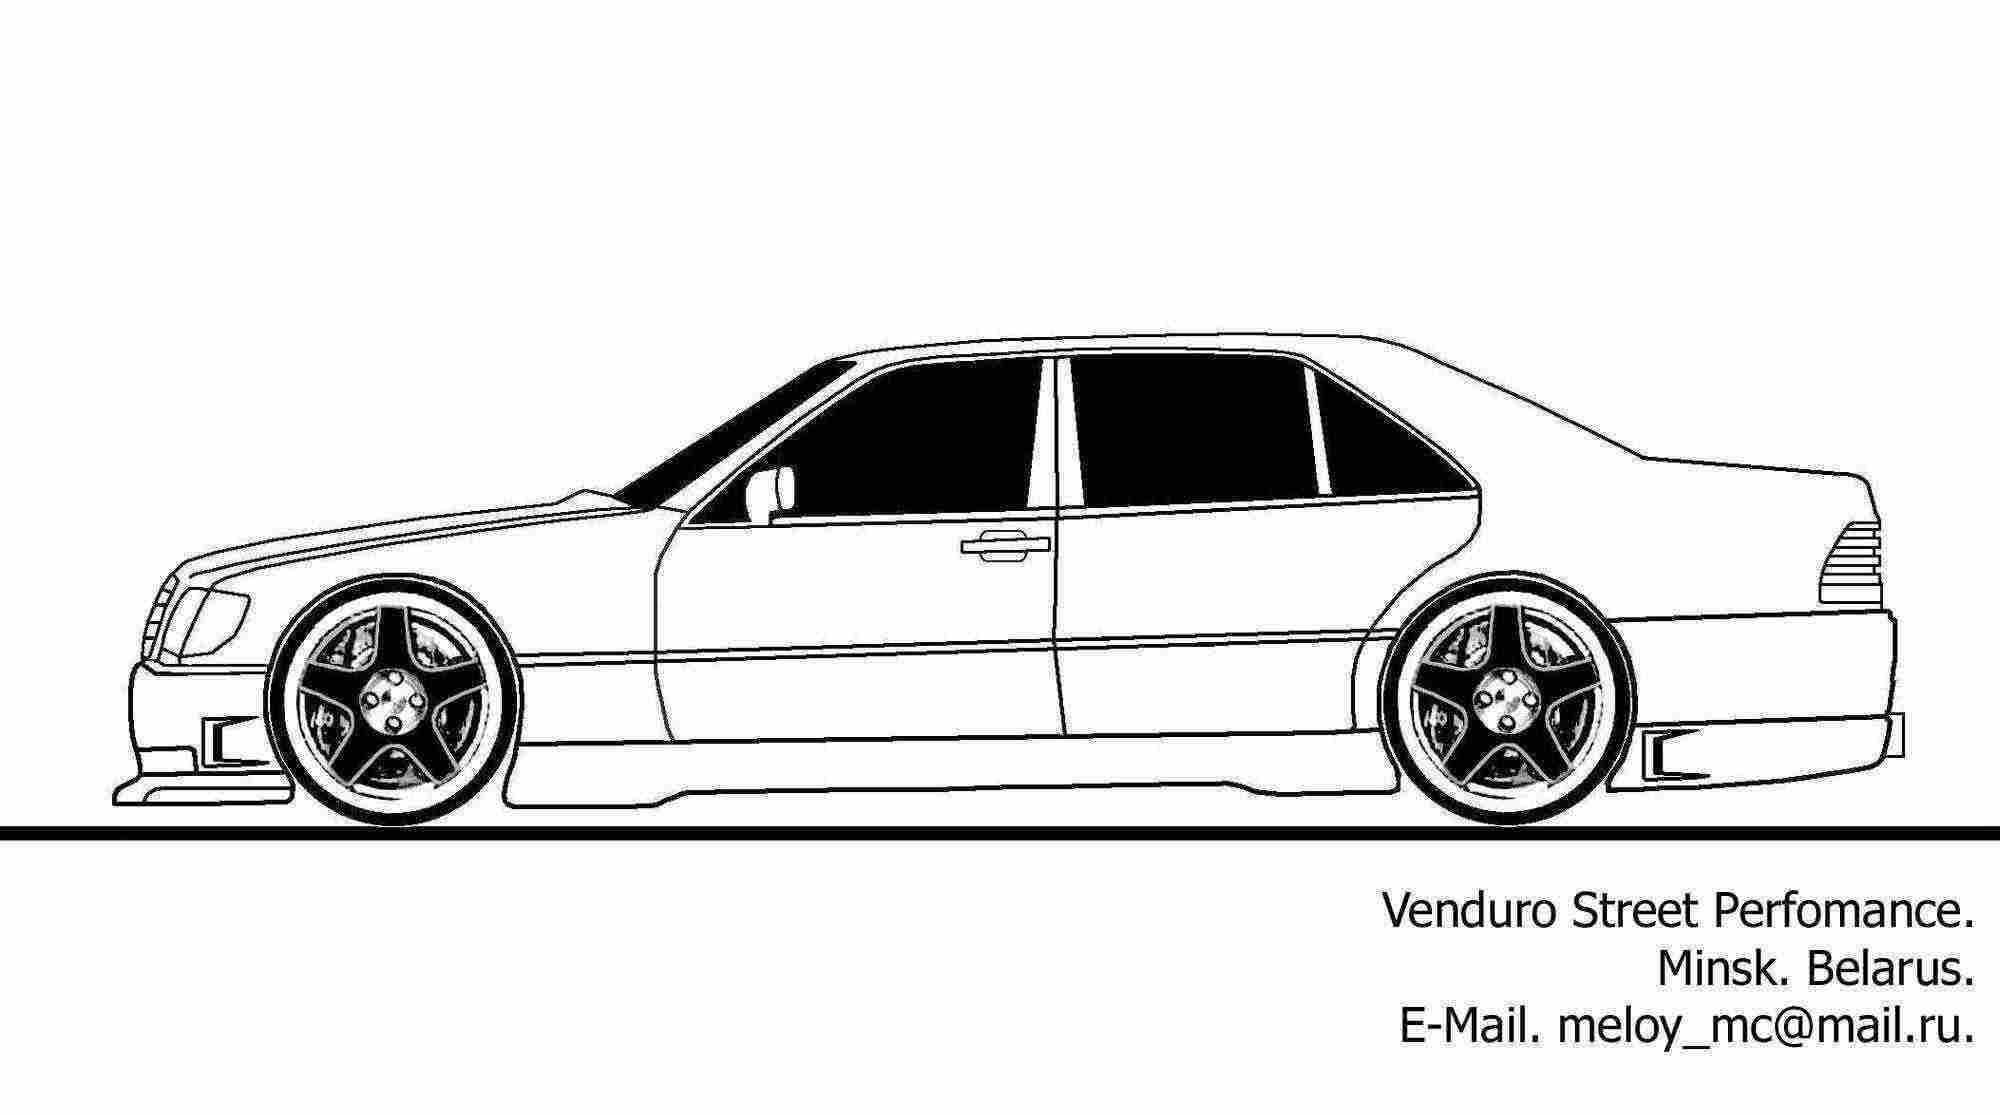 Mercedes Benz 140 Sedan-mercedes_benz_140_sedan.jpg